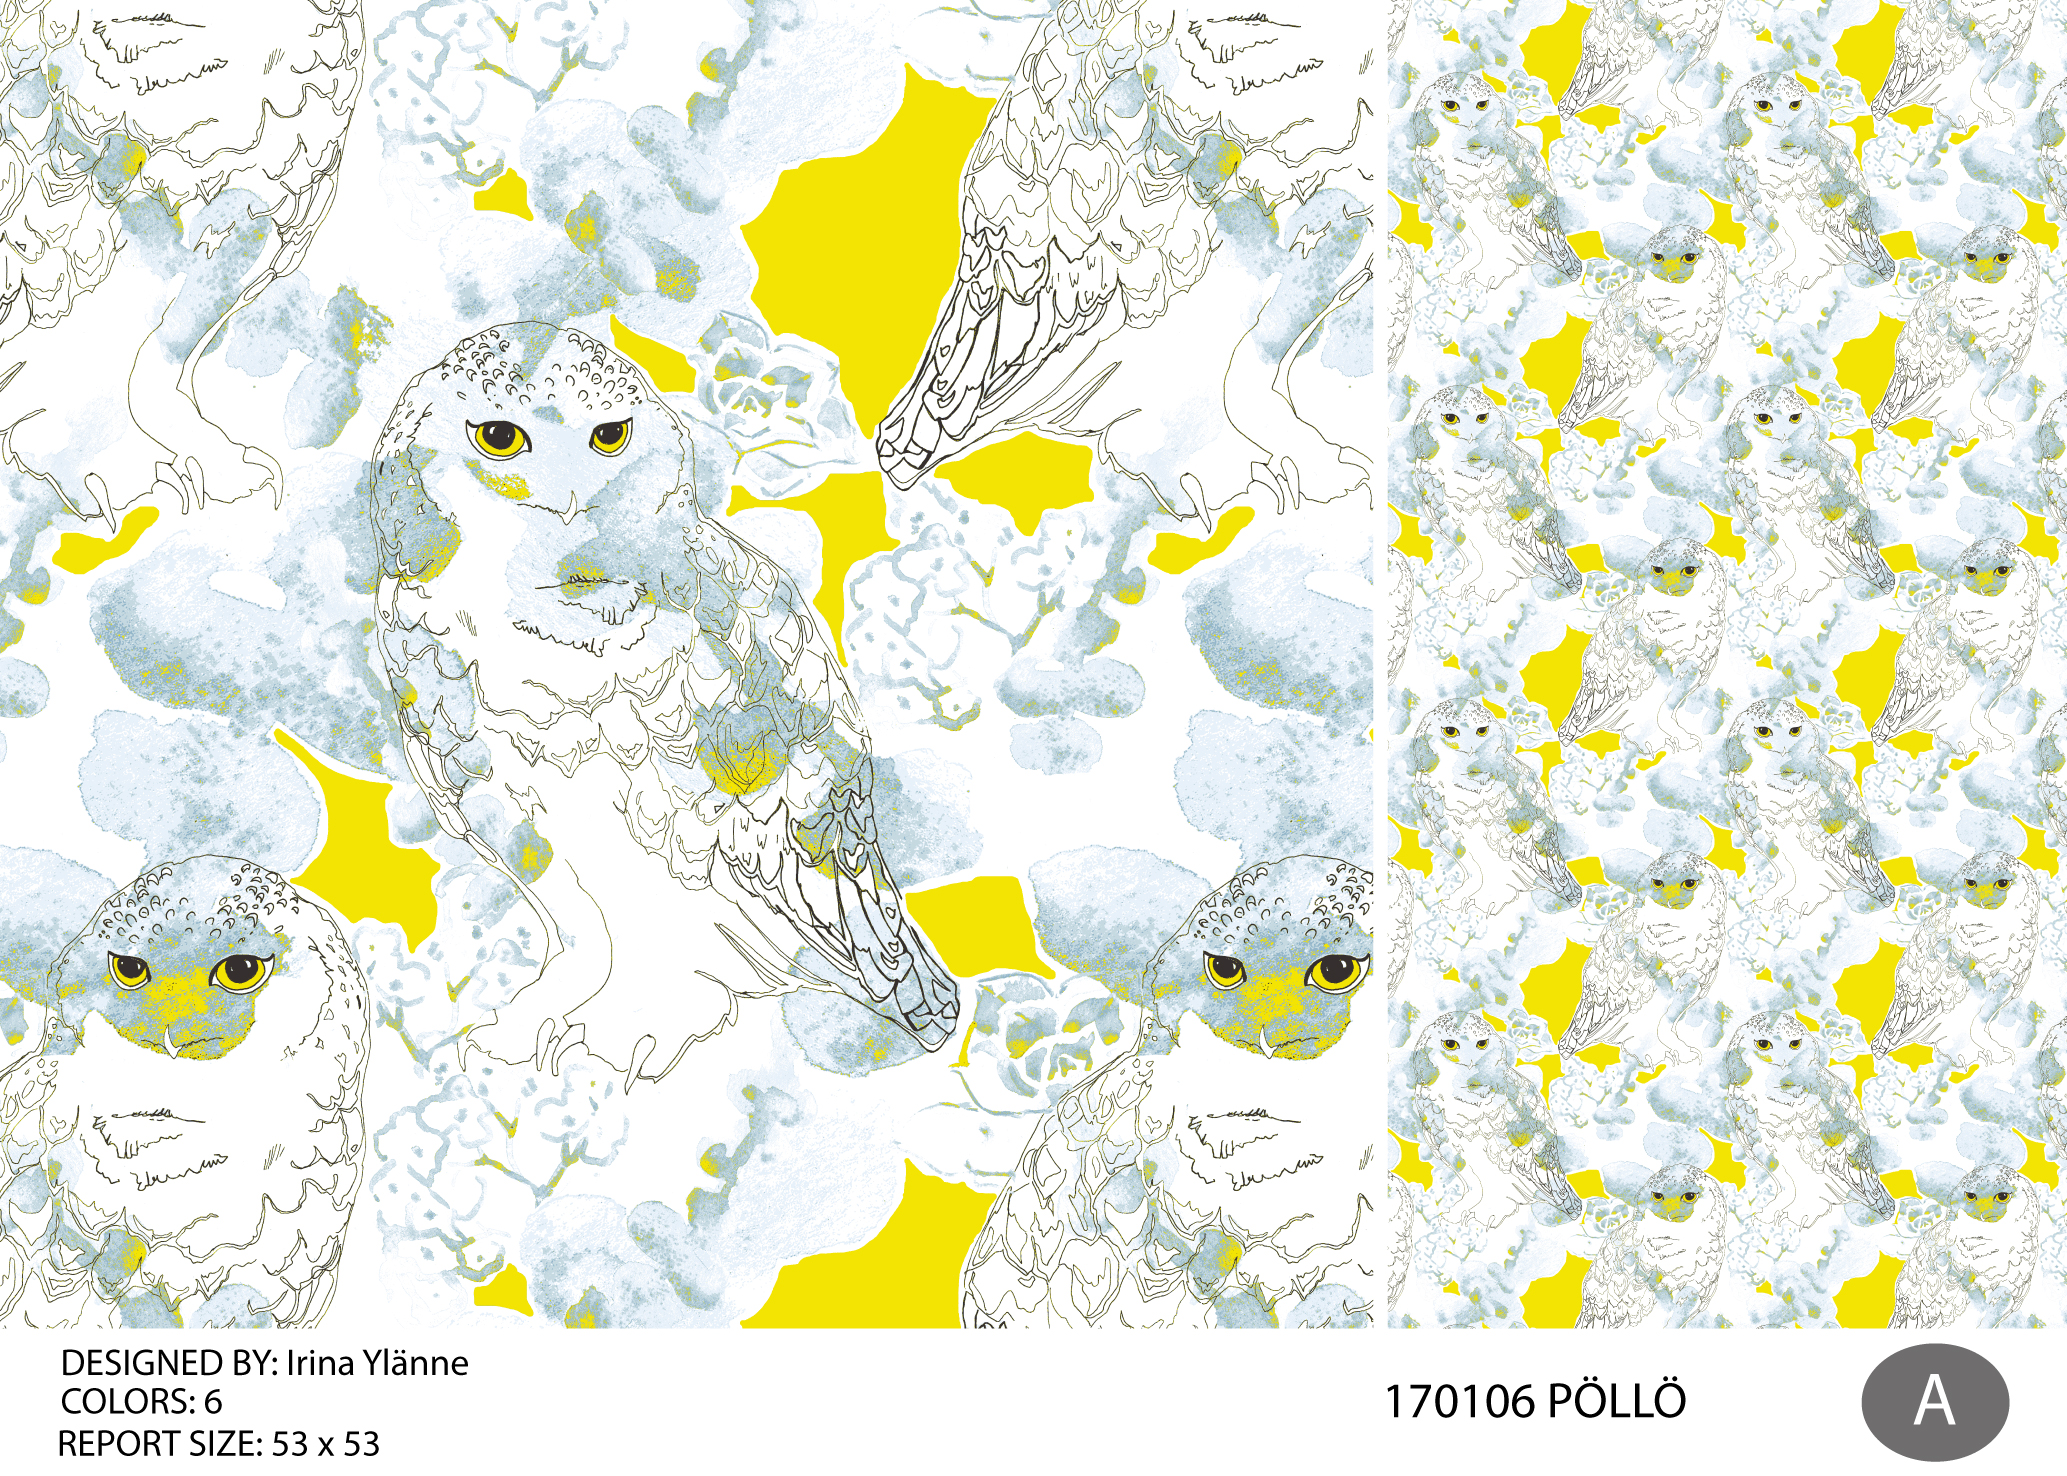 irina_pöllö_170106-05